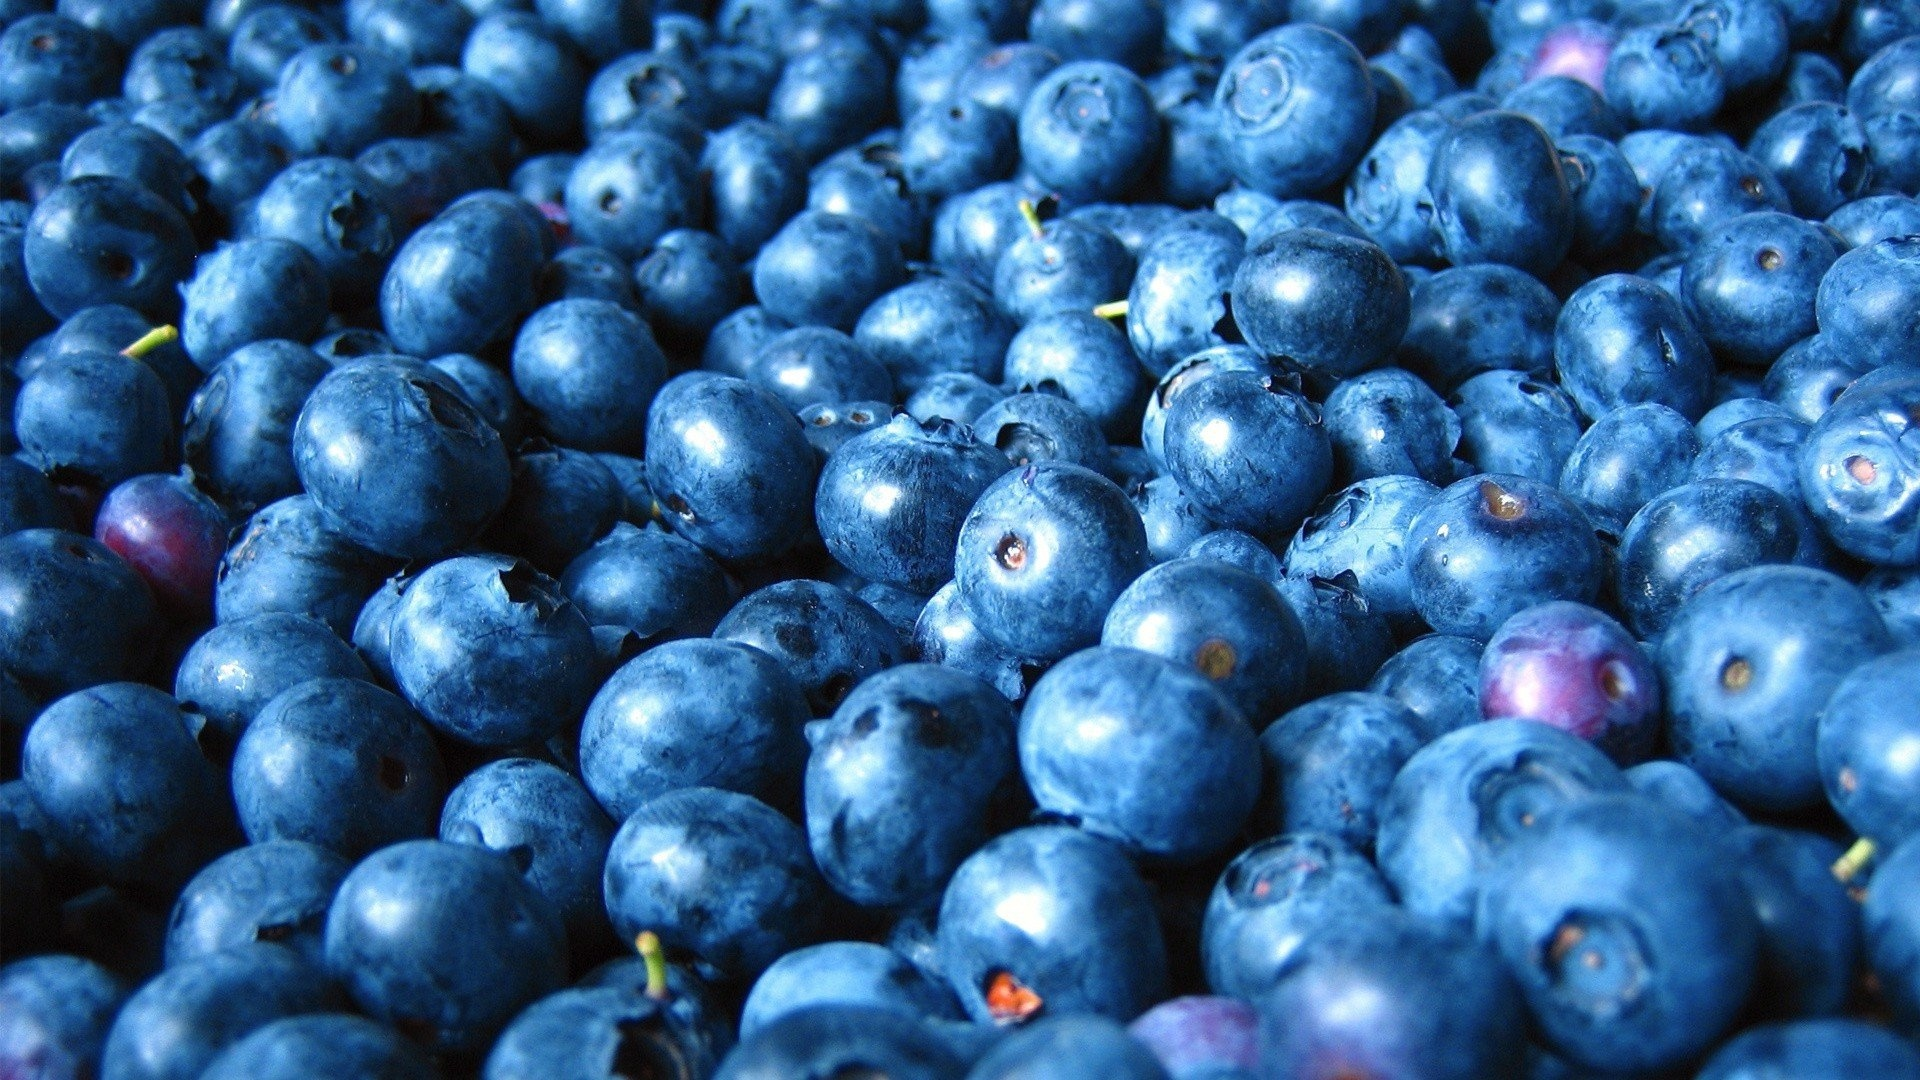 Blueberries HD Wallpaper